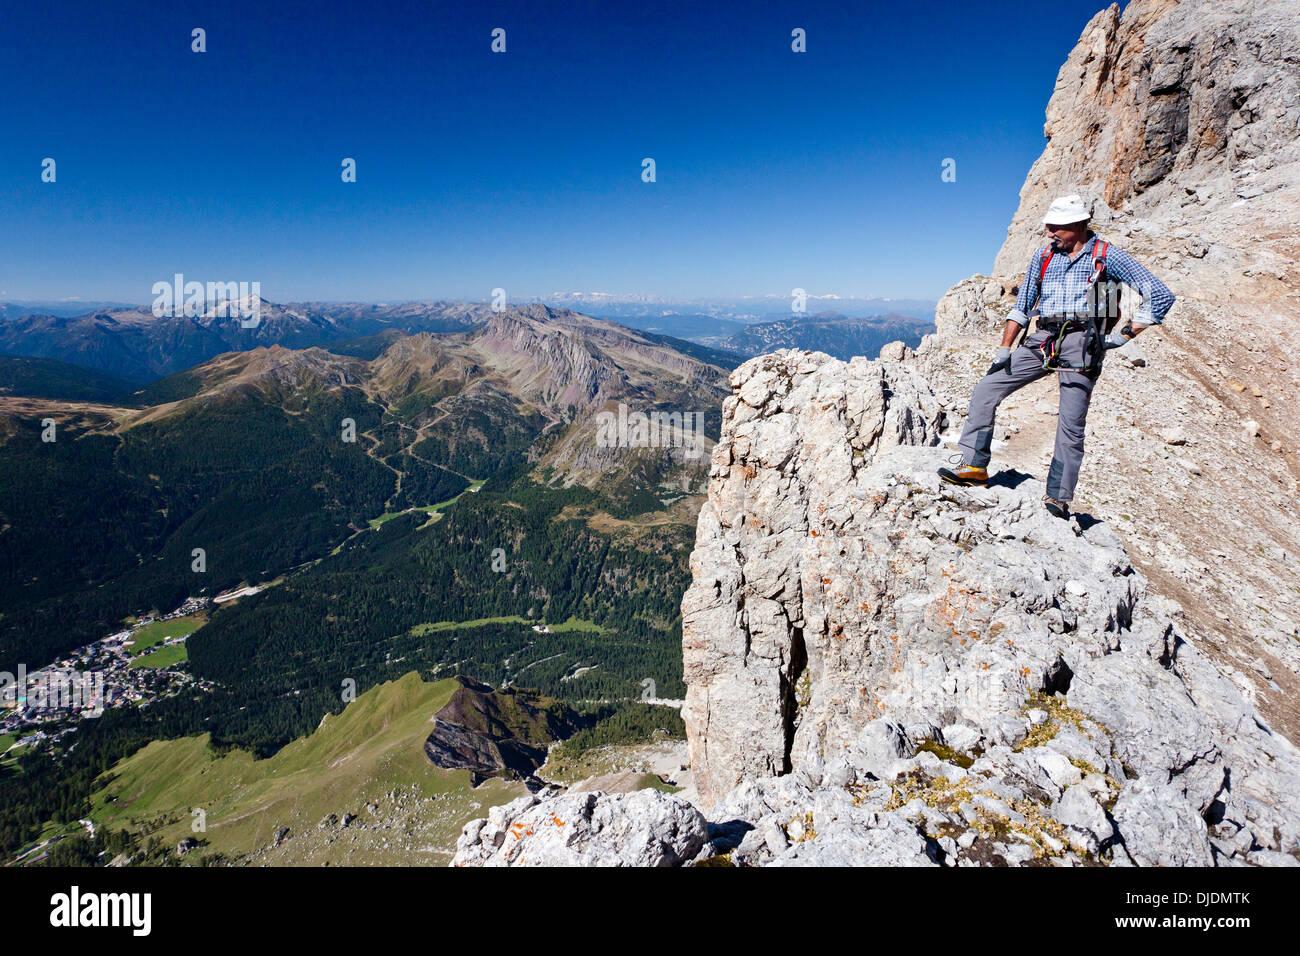 Klettersteig Via Ferrata : Paternkofel klettersteig via ferrata de luca innerkofler